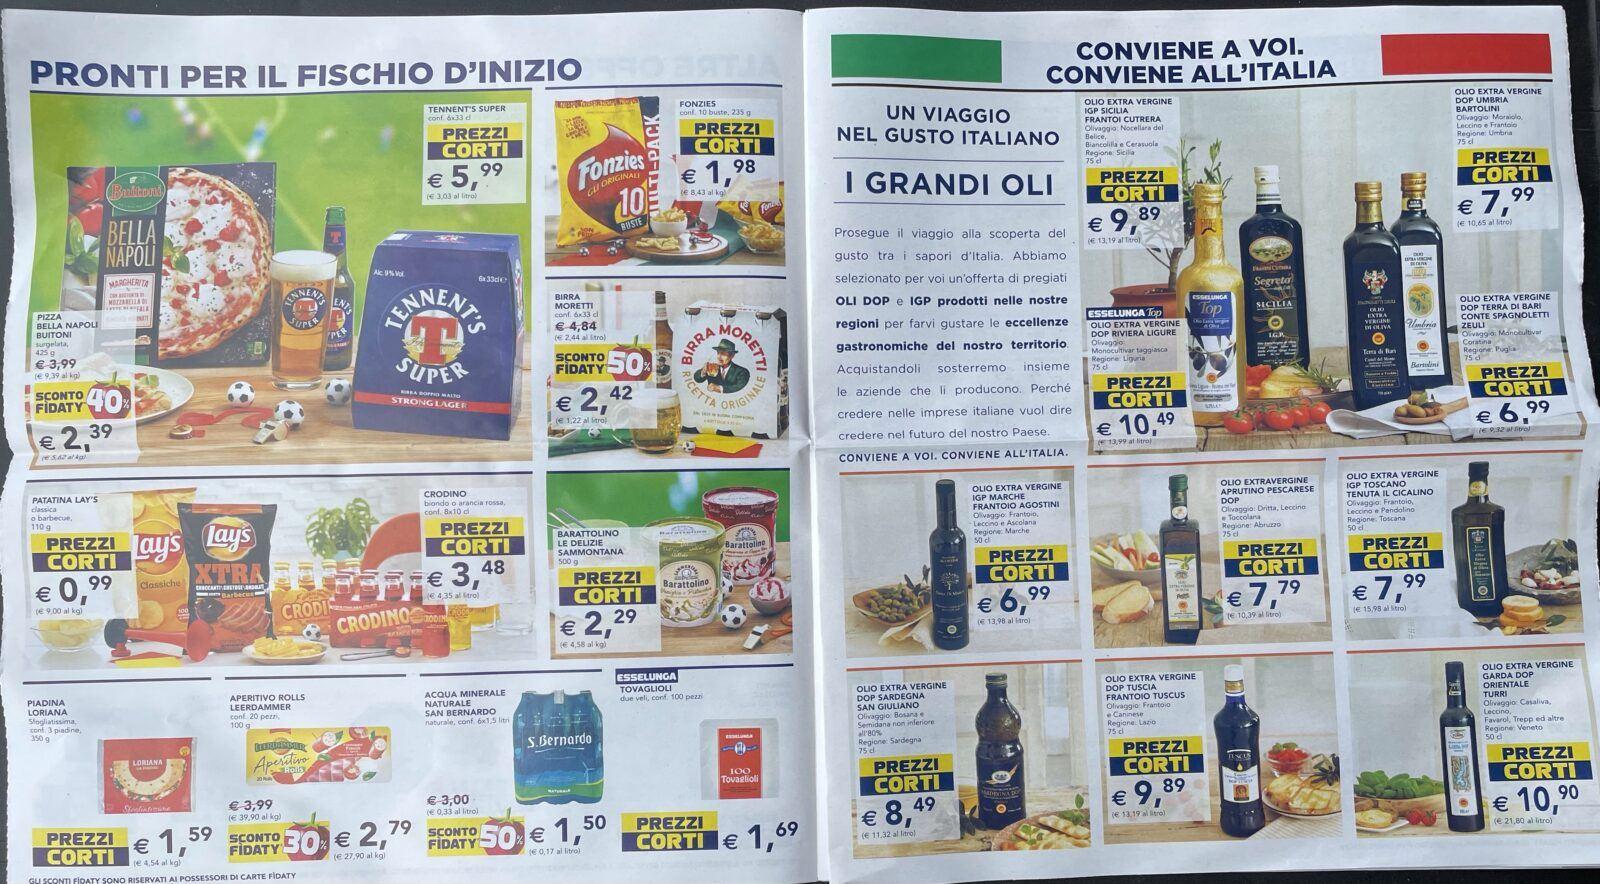 www.scontrinofelice.it img 7132 1 1600x884 Anteprima volantino Esselunga valido dal 10/06 al 19/06 2021